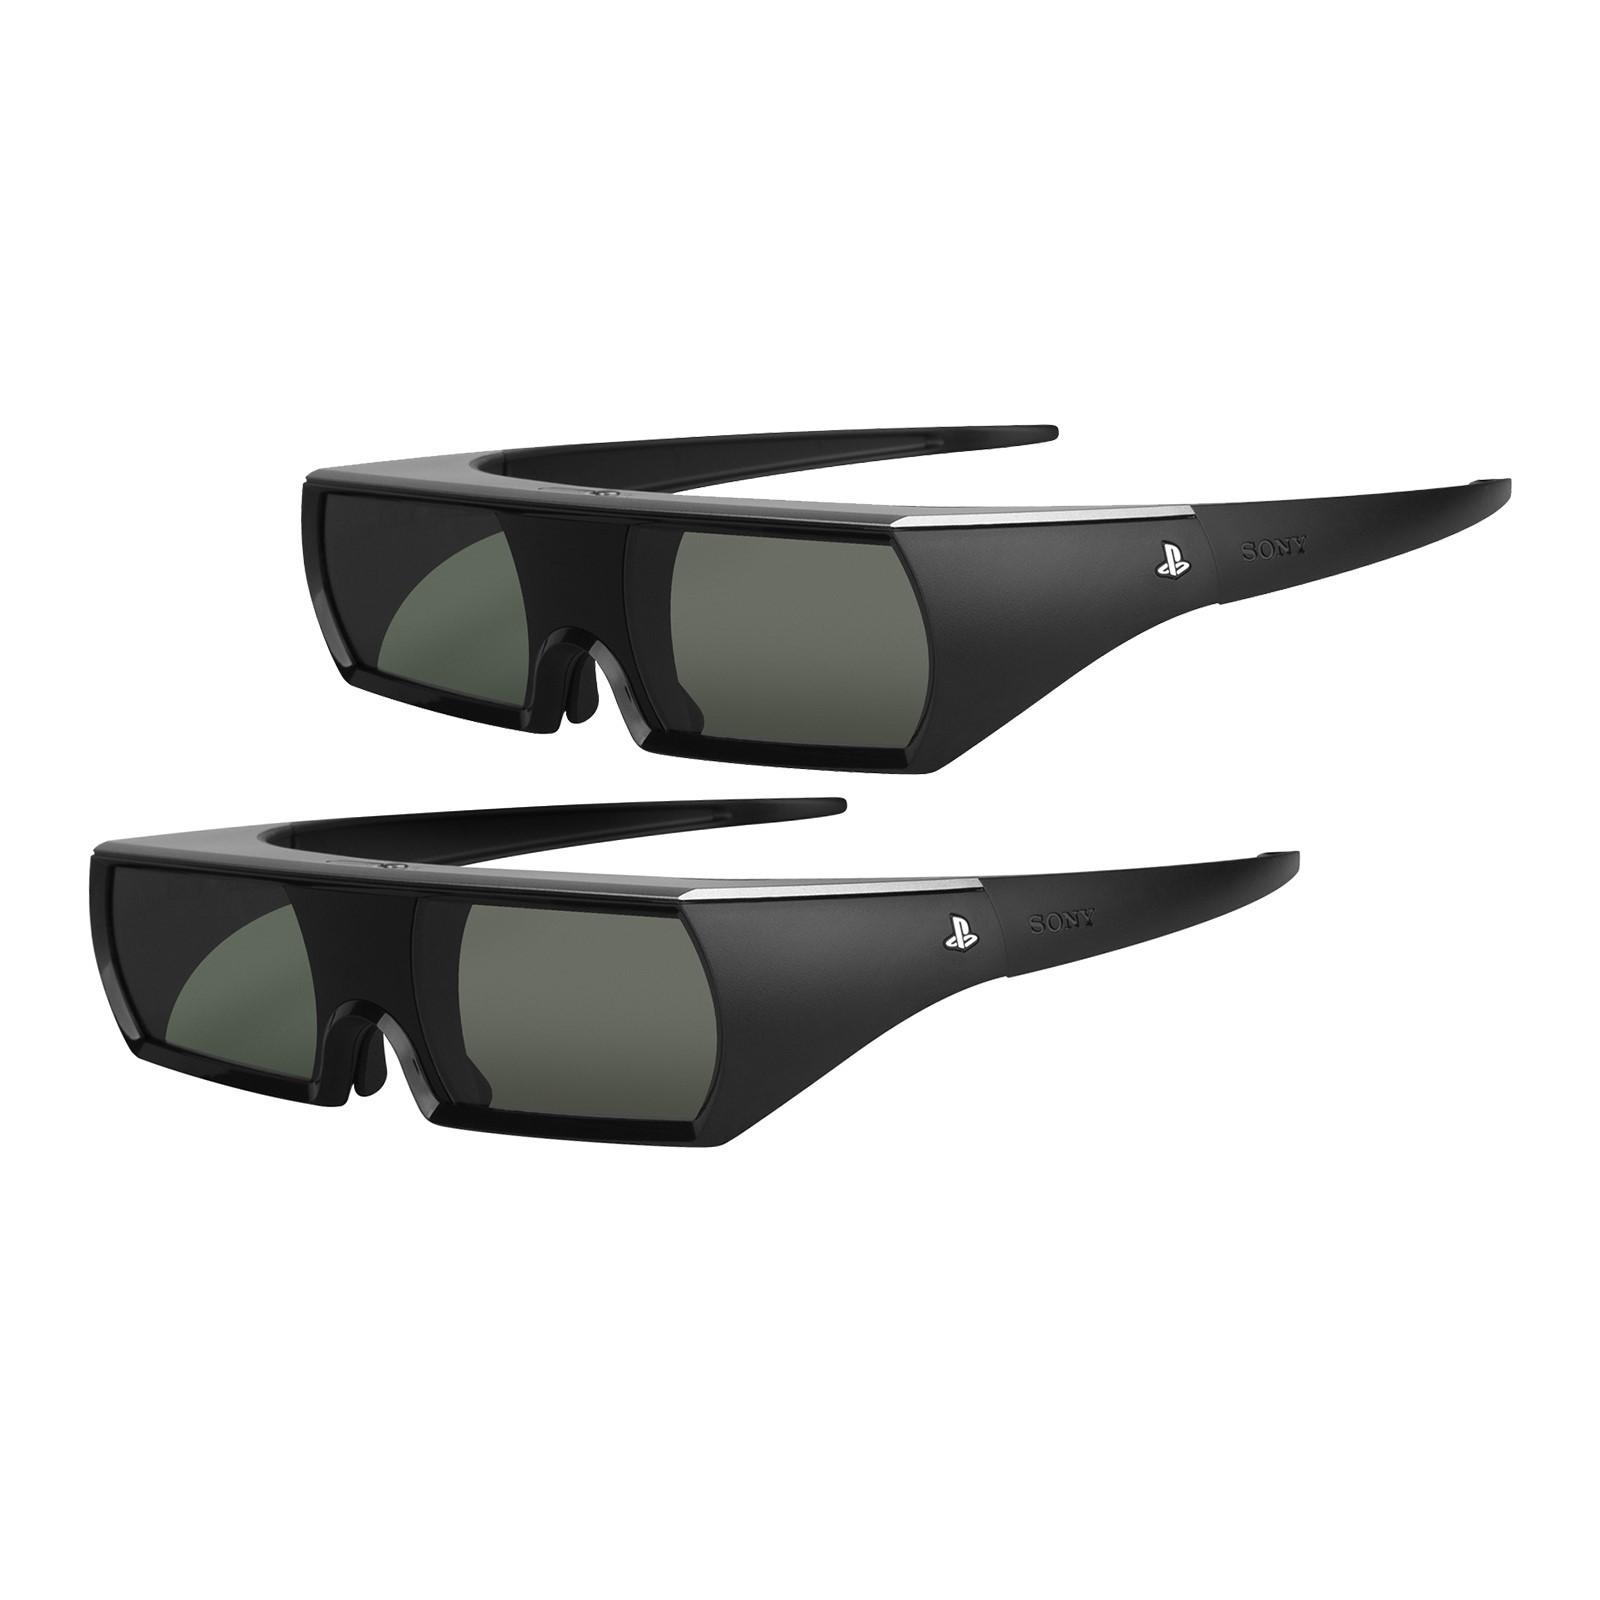 2-Pack Sony PS3 Active Shutter 3D Glasses (Black) SON-PS3-3DGLASSES-A2-2PK